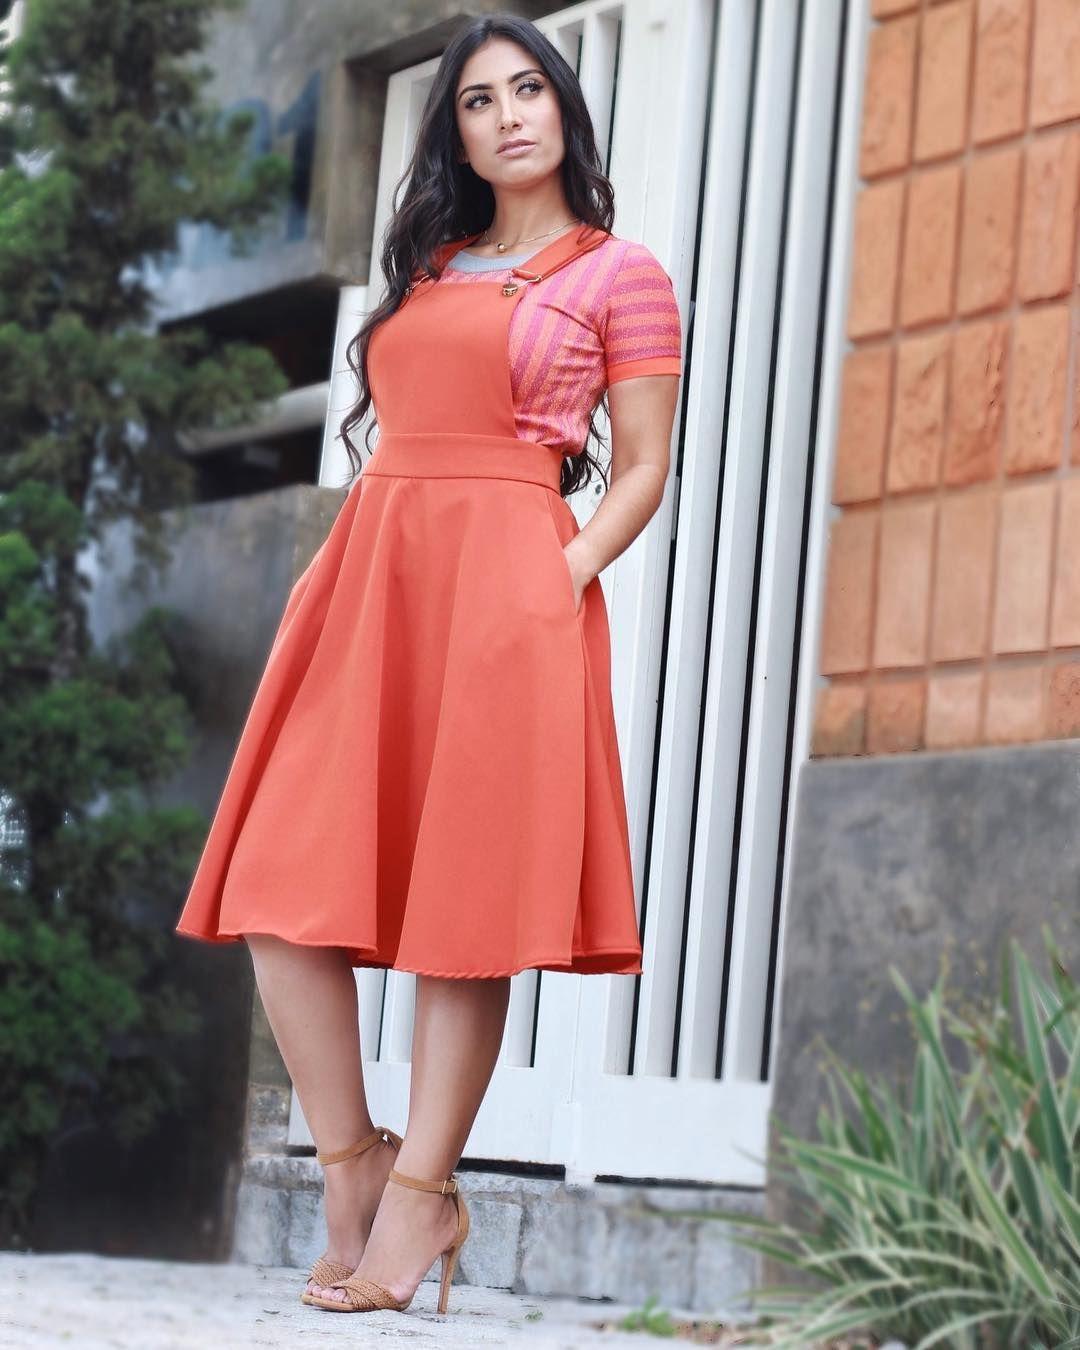 4b29bc9f167e Laranja 💜 Vestidos Para Igreja, Saias Da Moda, Moda Evangelica Feminina,  Roupas De